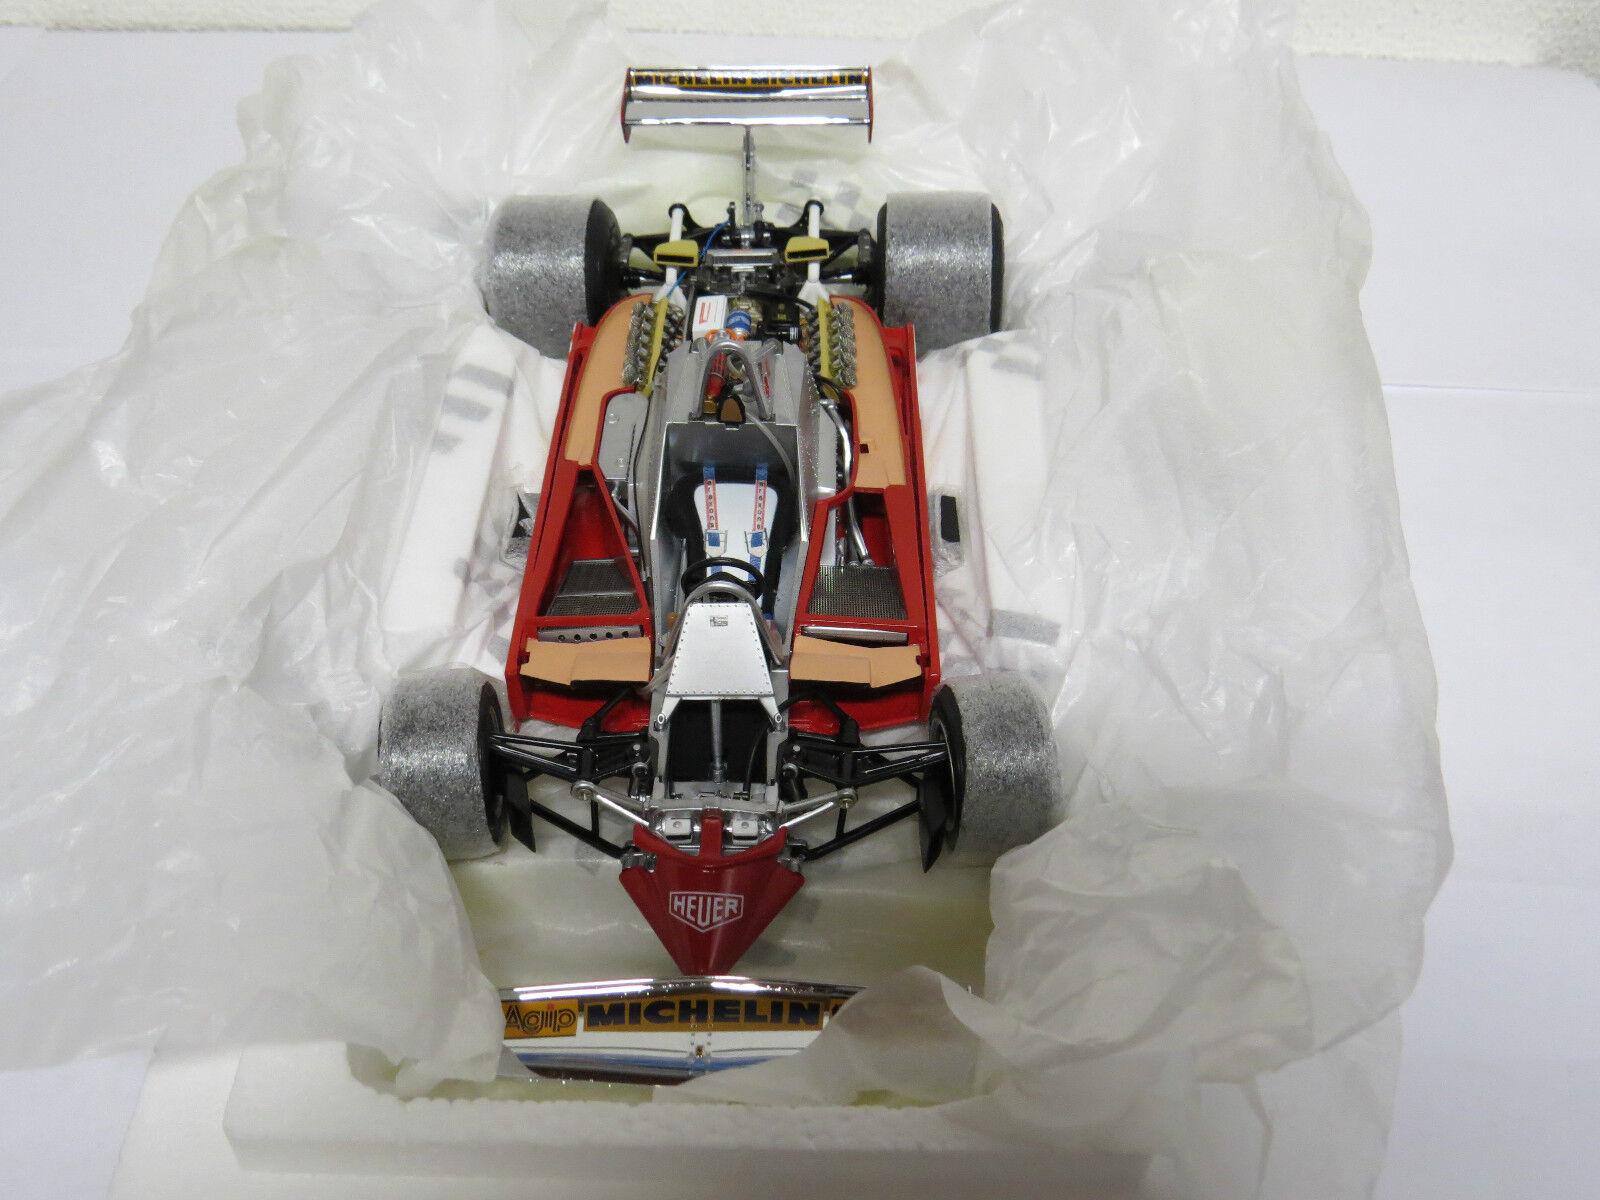 Ferrari 1 18 Exoto Jody Schecter 1979 GPC97070